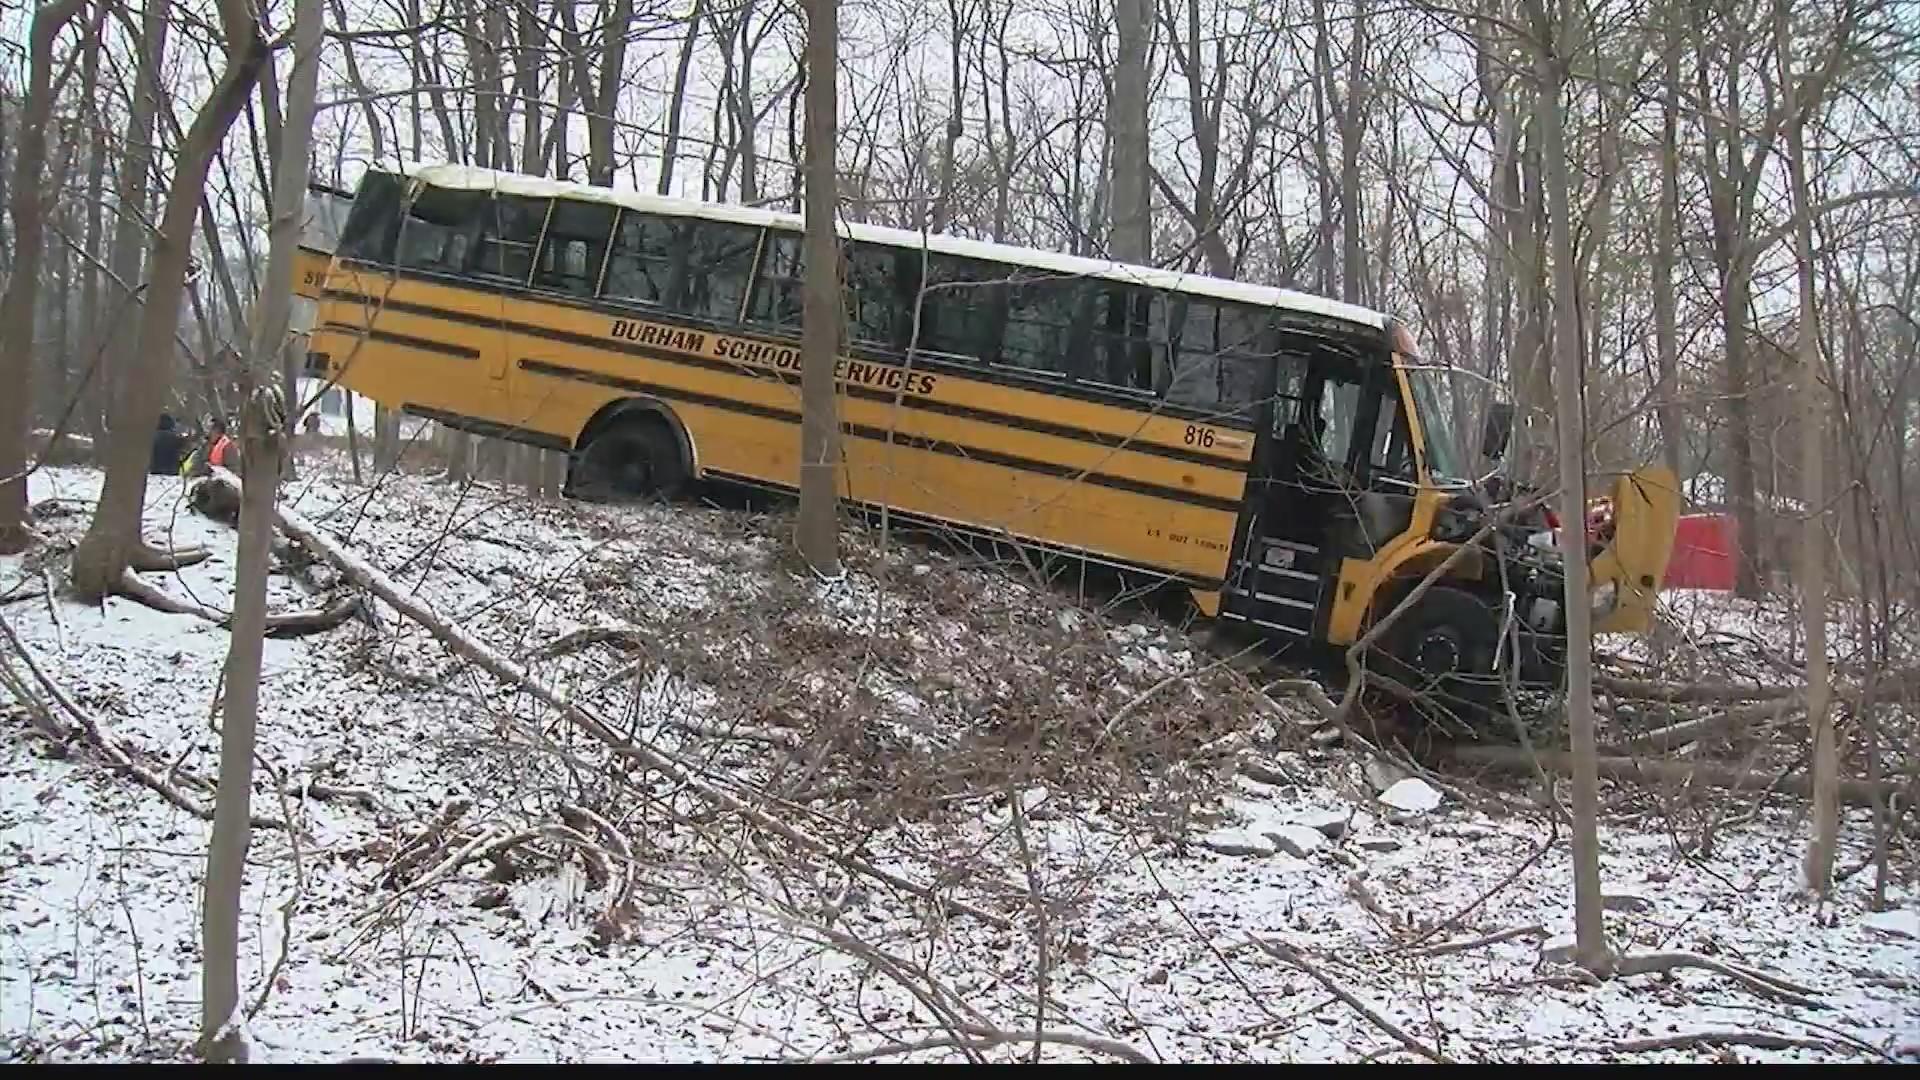 Three_students_hurt_in_school_bus_crash_0_20190129190425